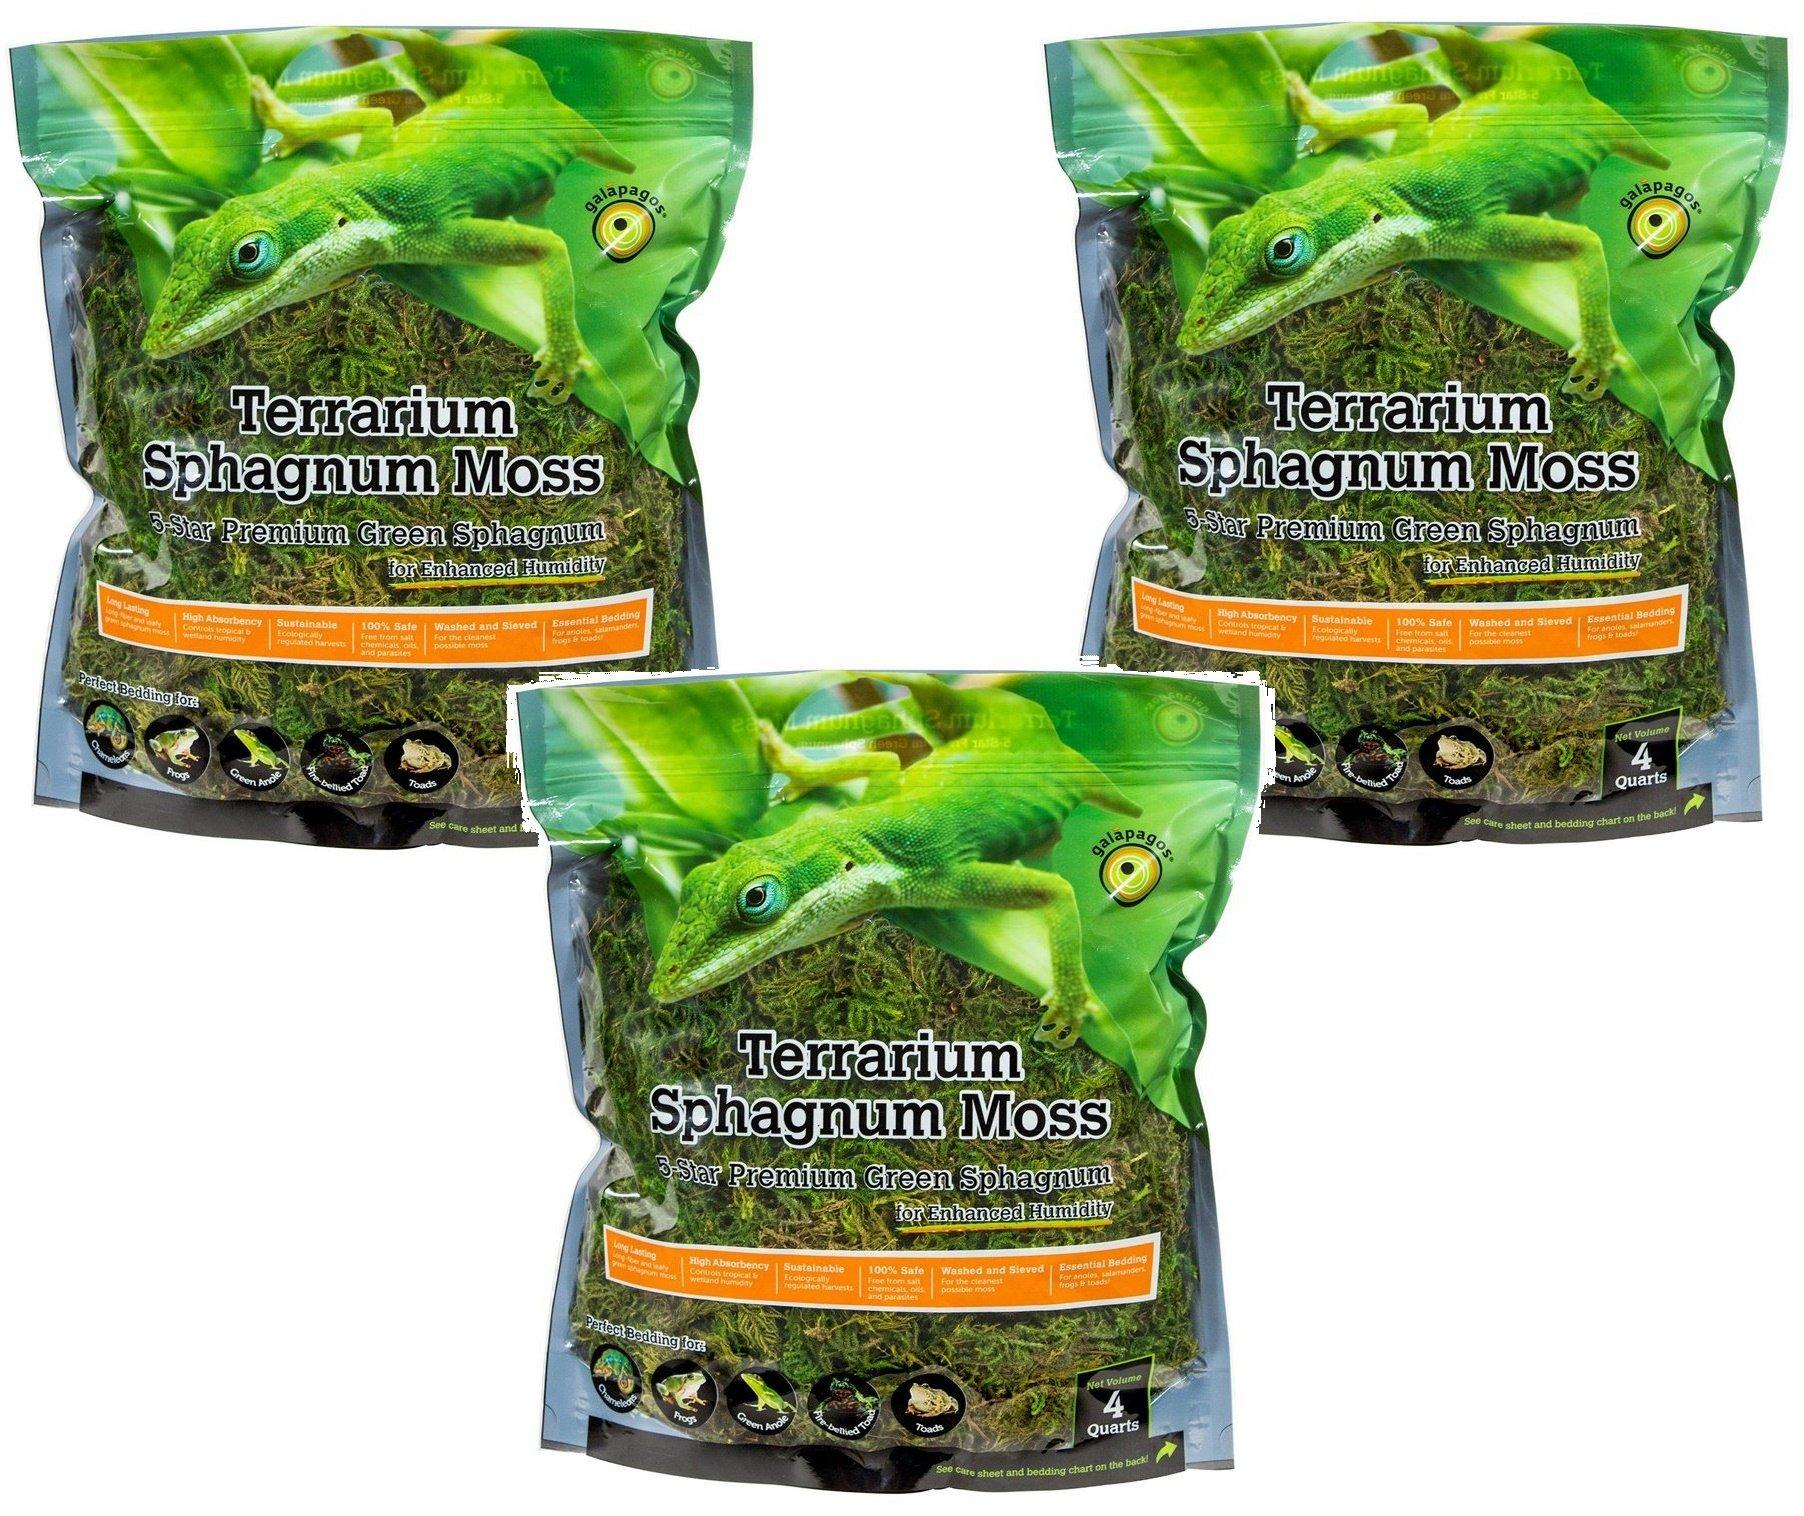 Galápagos Terrarium Sphagnum Moss, 5-Star Green Sphagnum, Natural, 4QT (3 Pack)